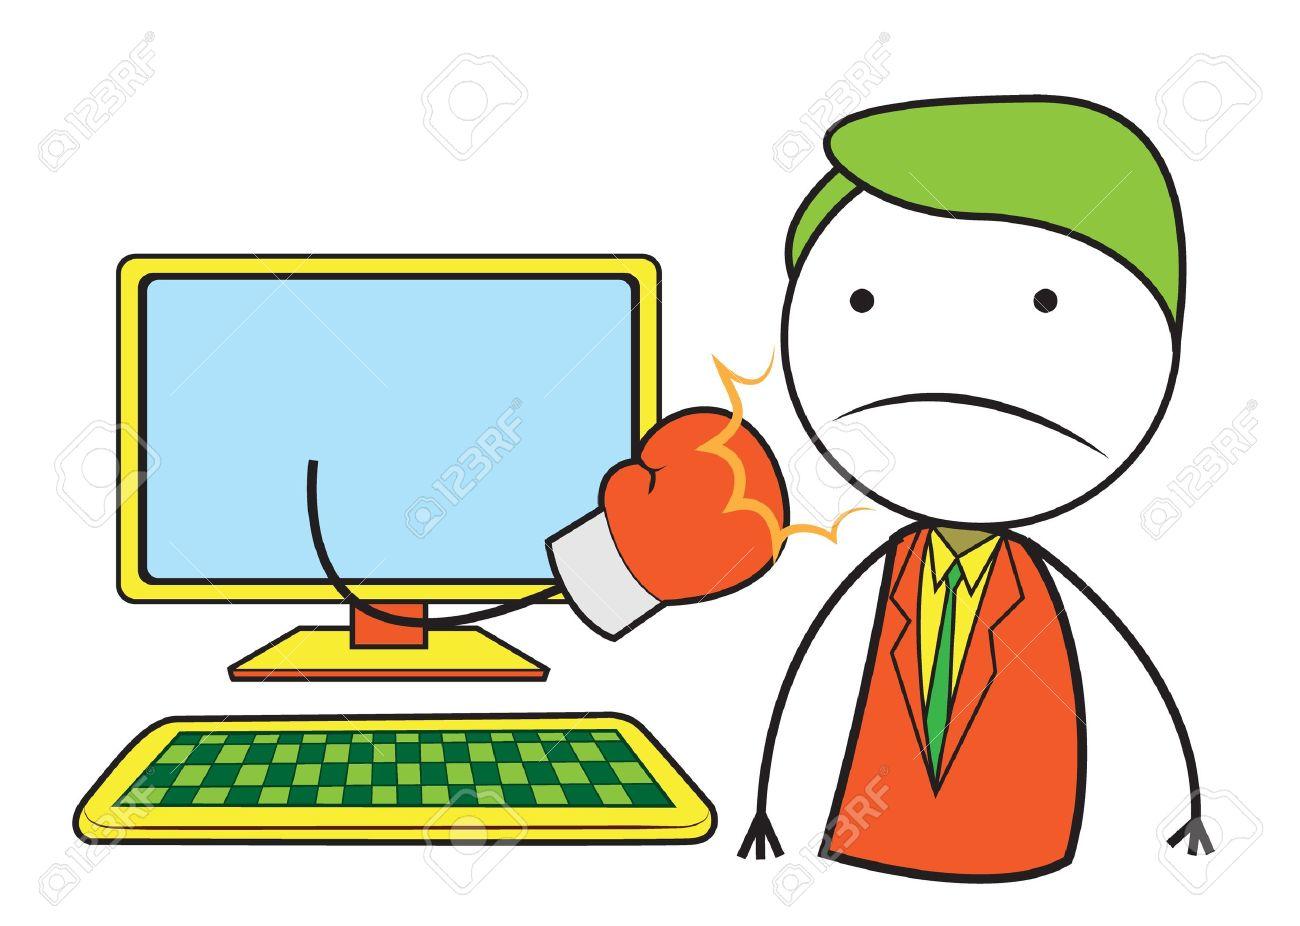 Cyber bully clipart ClipartFox cyberbull-Cyber bully clipart ClipartFox cyberbullying internet bully. Cyber bully clipart ClipartFox cyberbullying internet bully-15